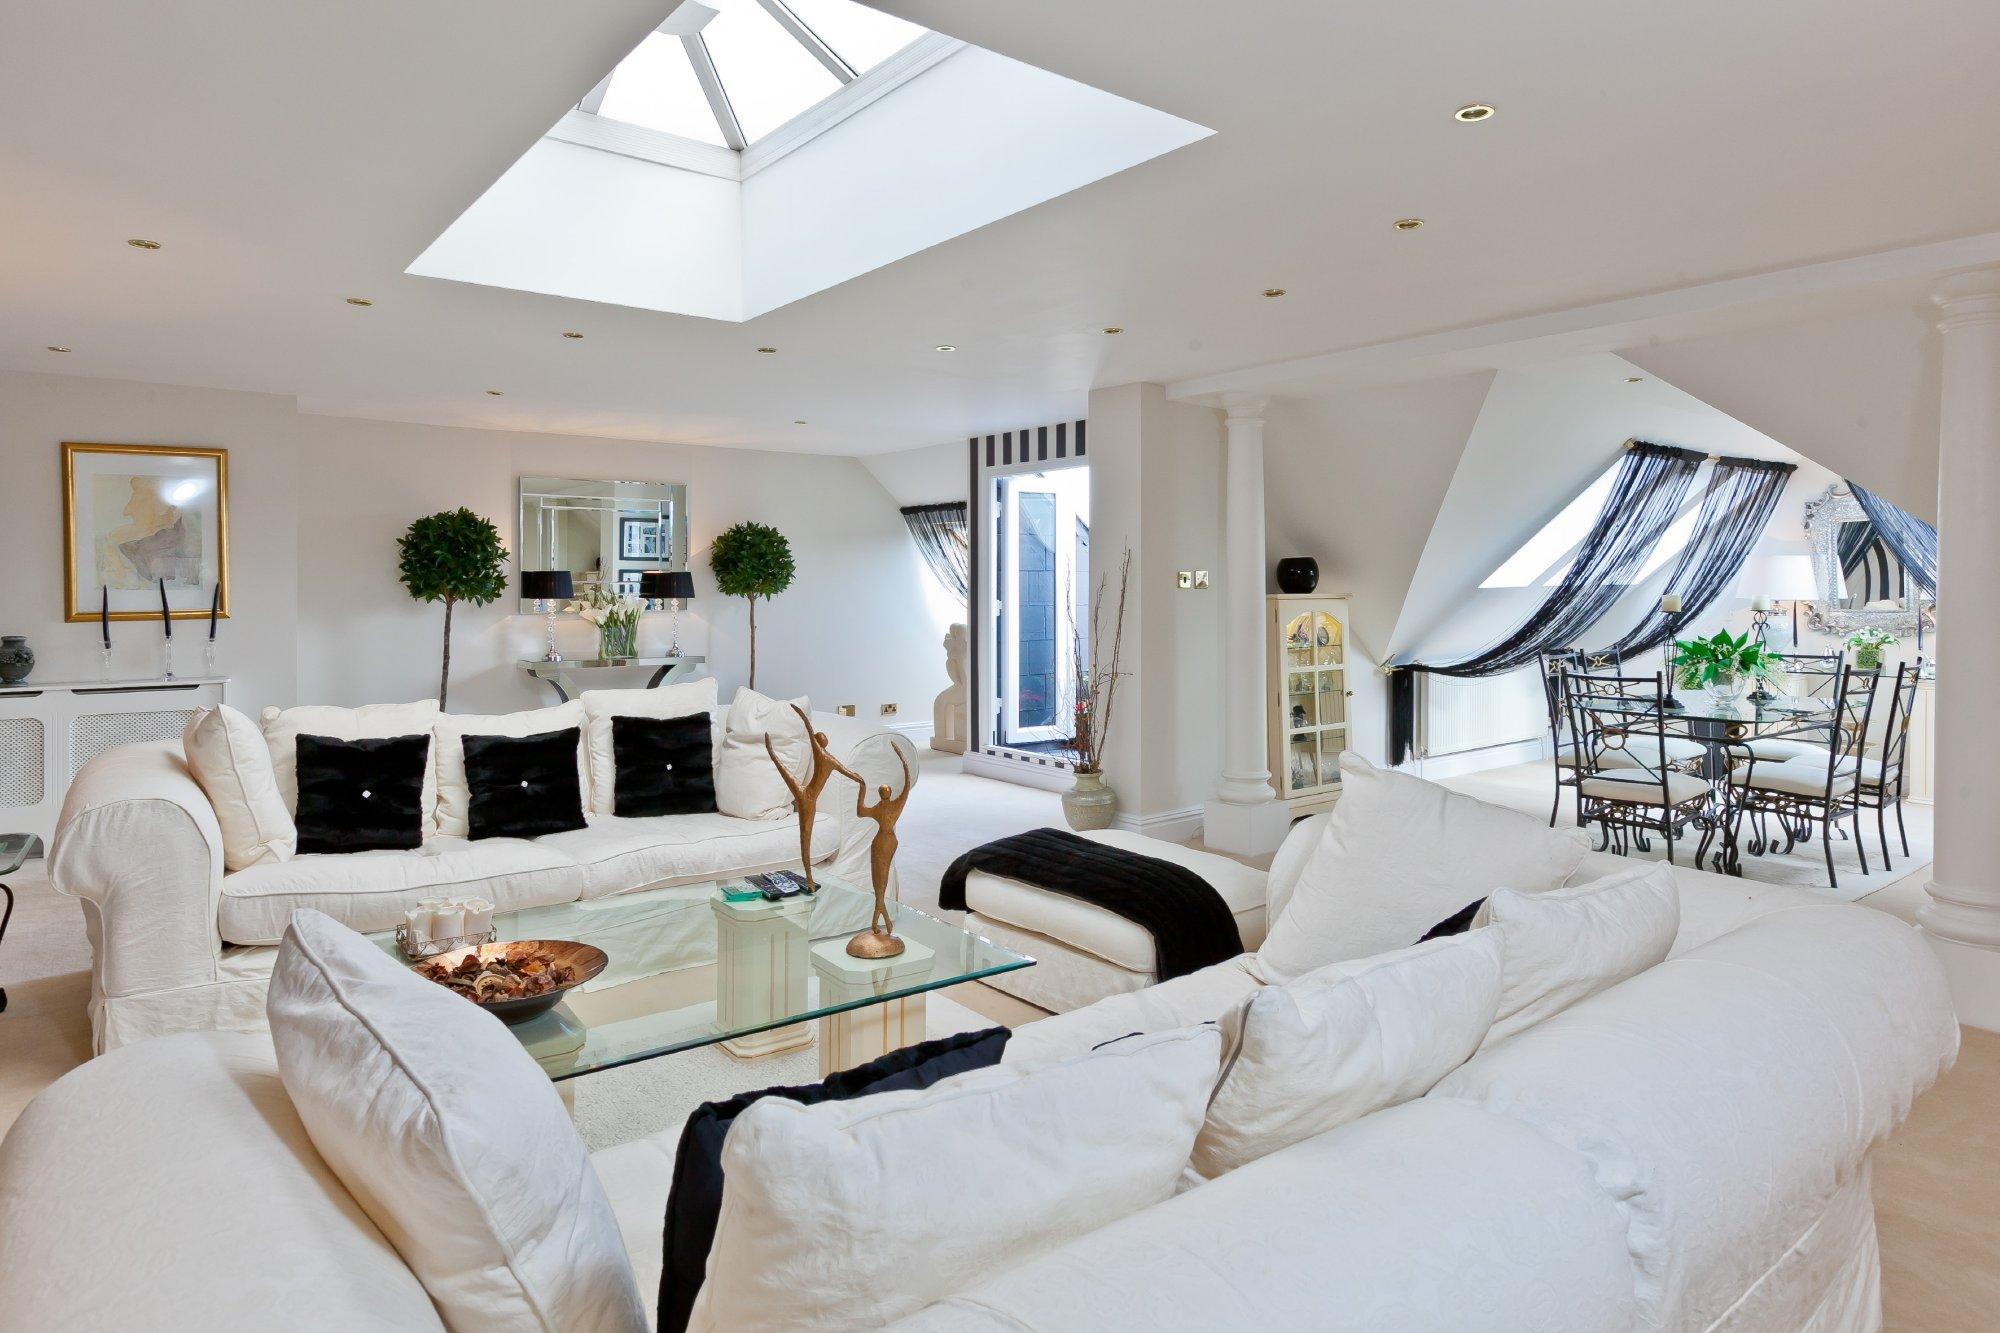 Whiteoak,Lounge